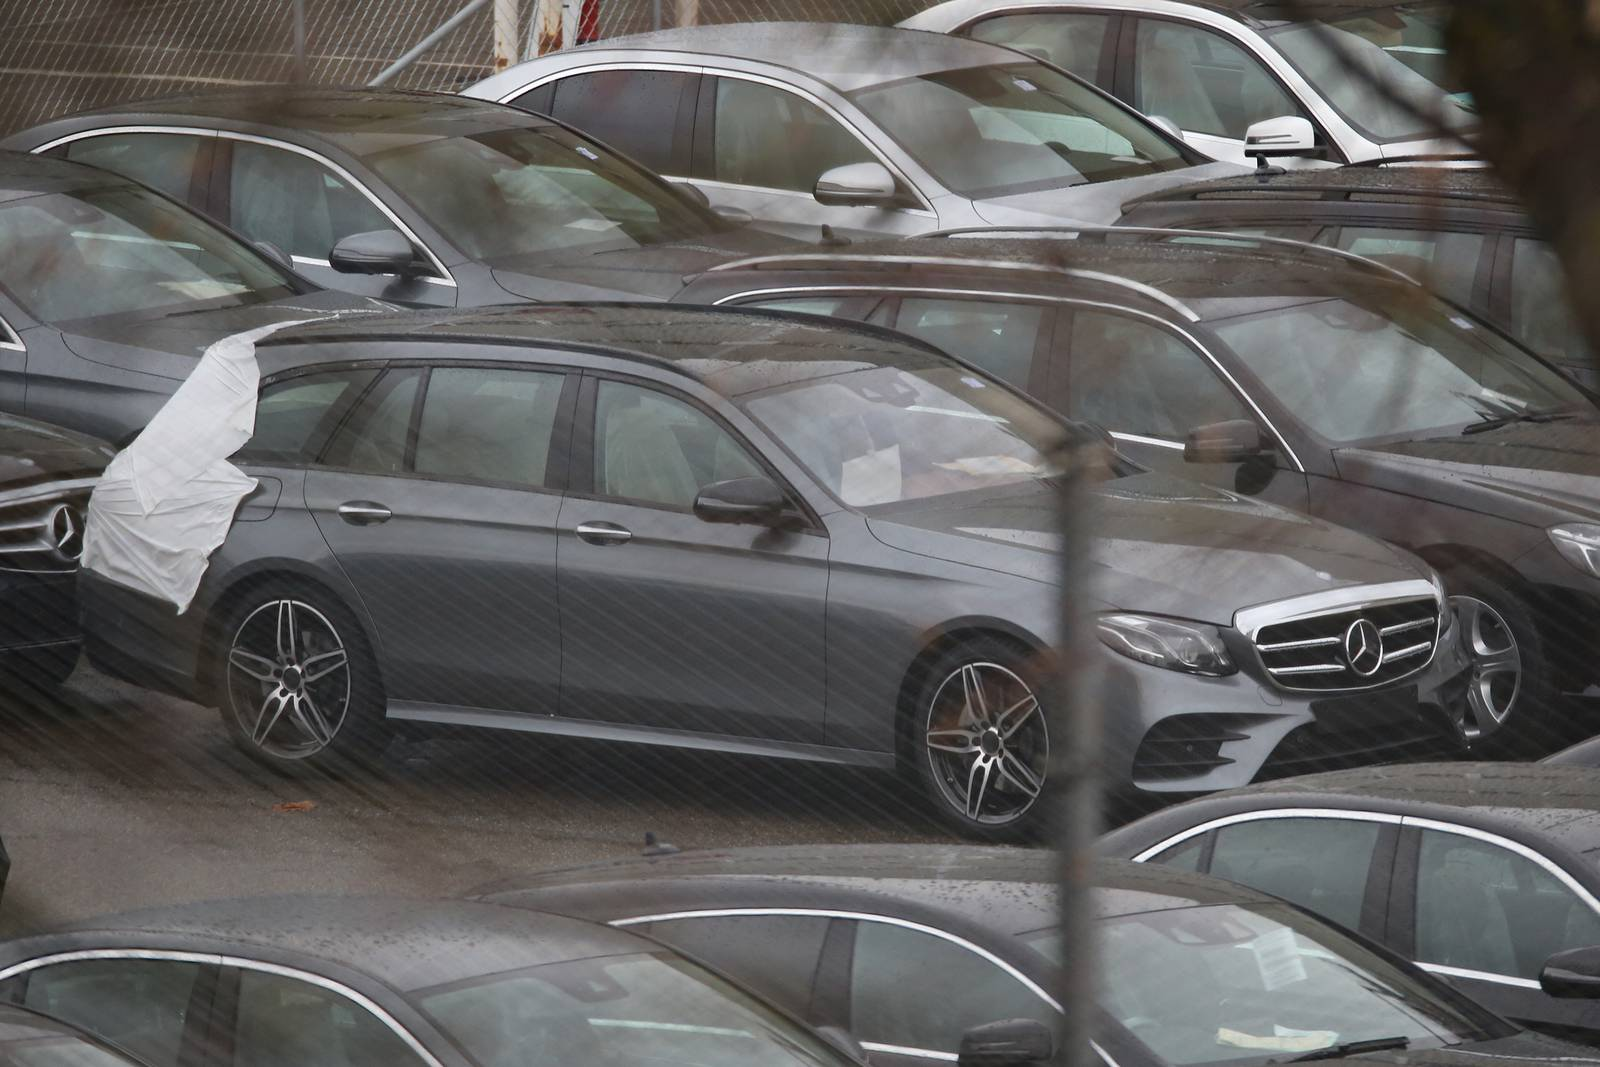 Official: 2017 Mercedes-Benz E-Class Estate Naked Spy Shots